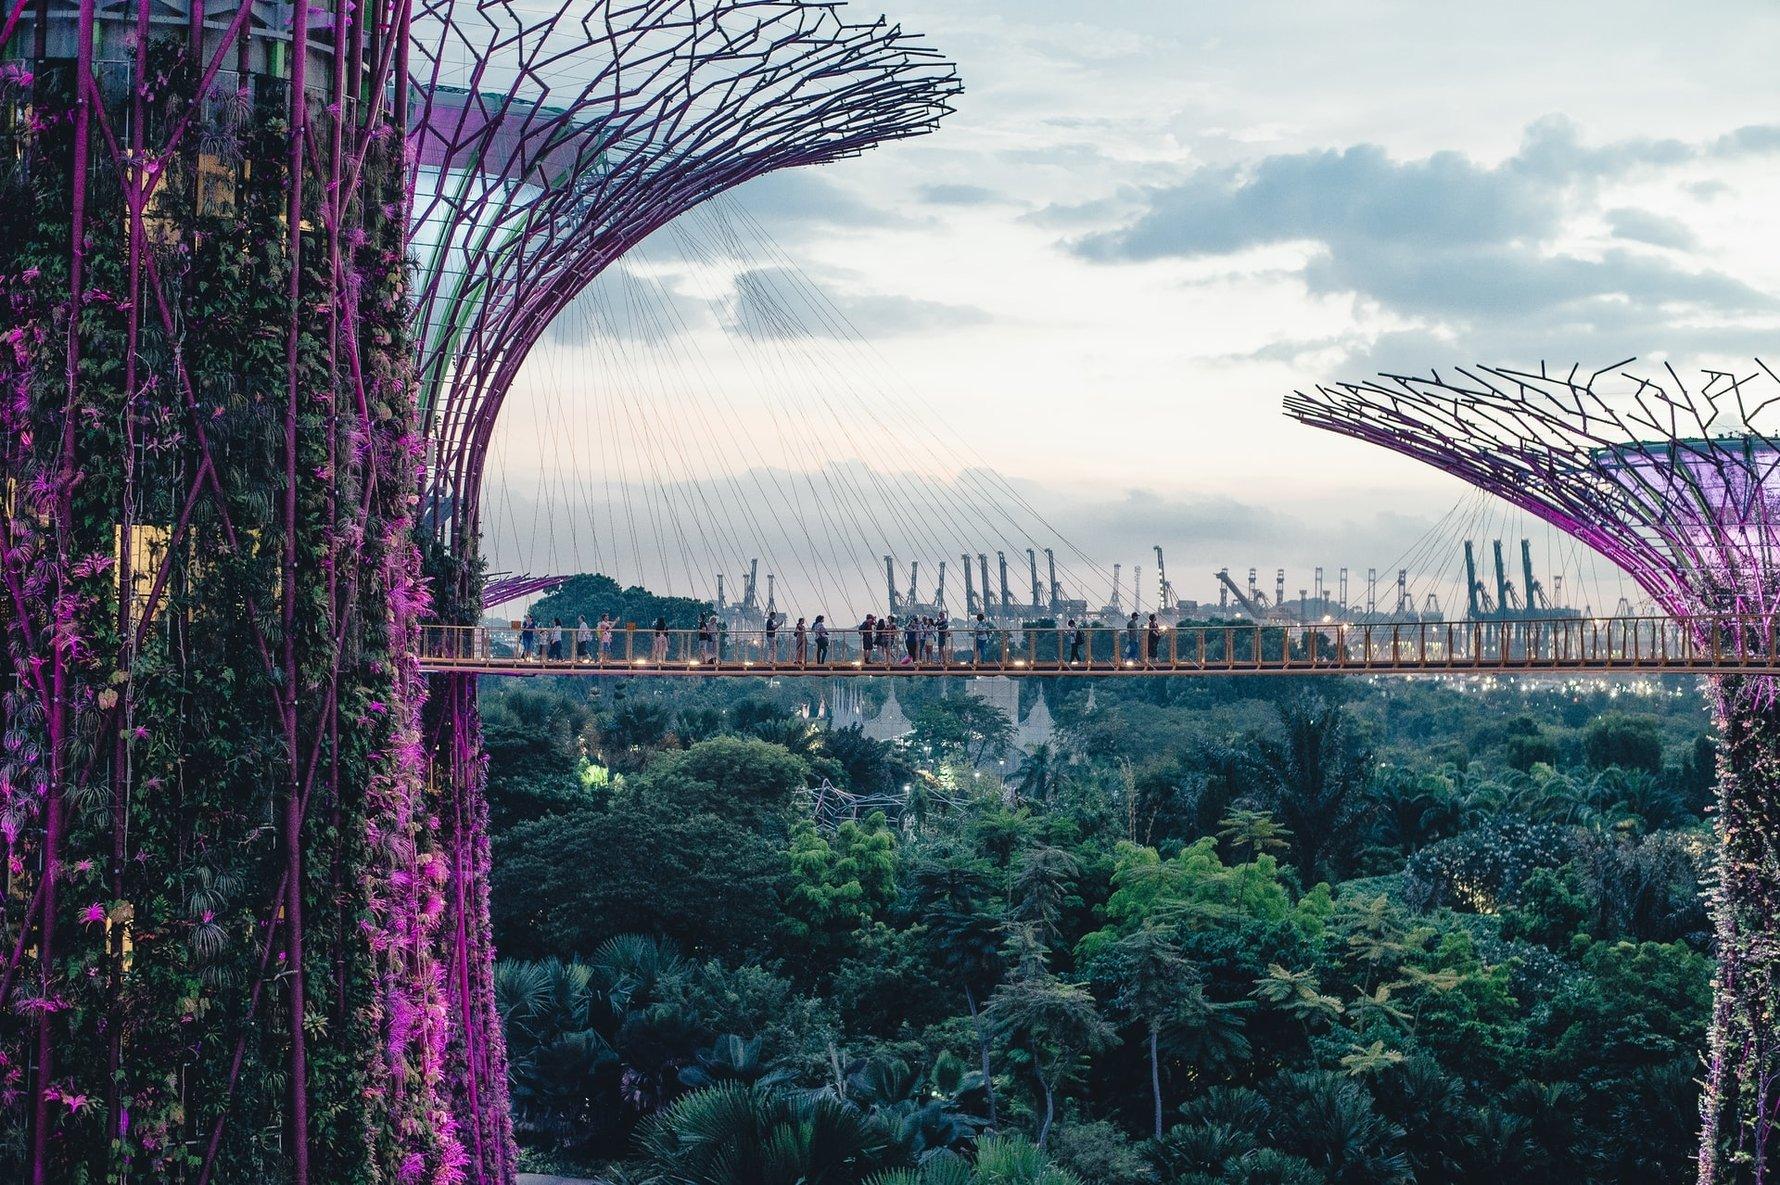 24 Hours in Singapore - Supertrees © annie-spratt